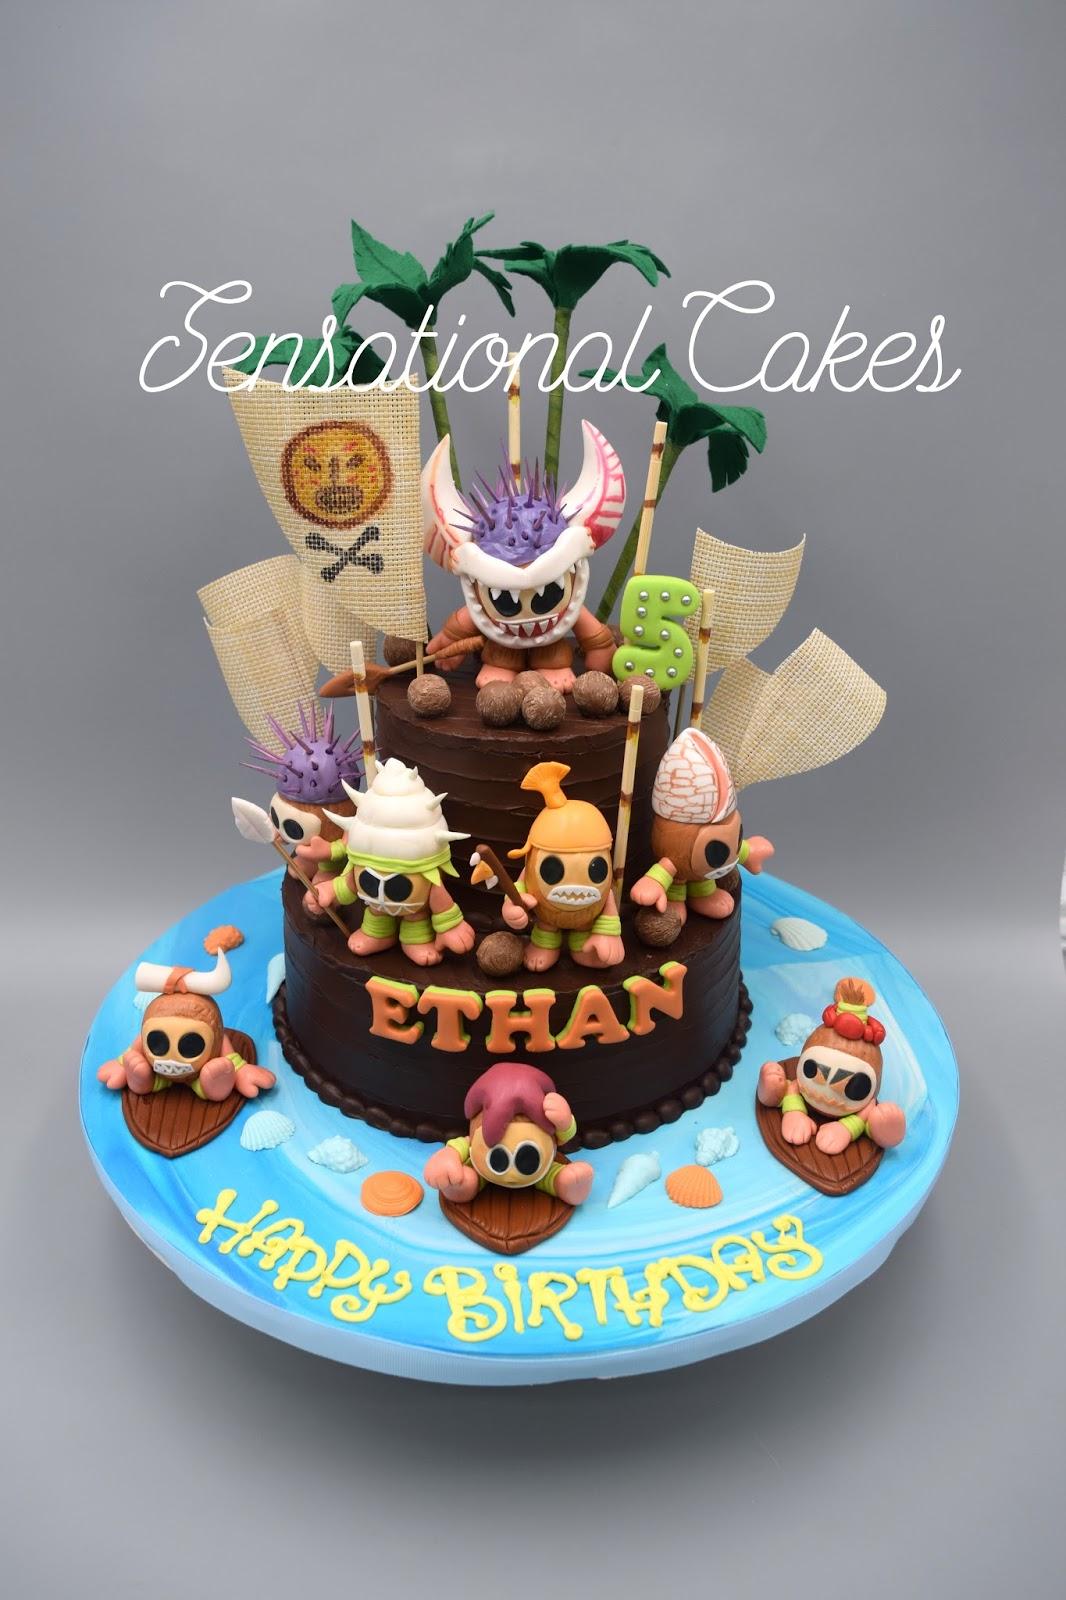 The Sensational Cakes Kakamora Moana Creatures 3d Cakes Singapore